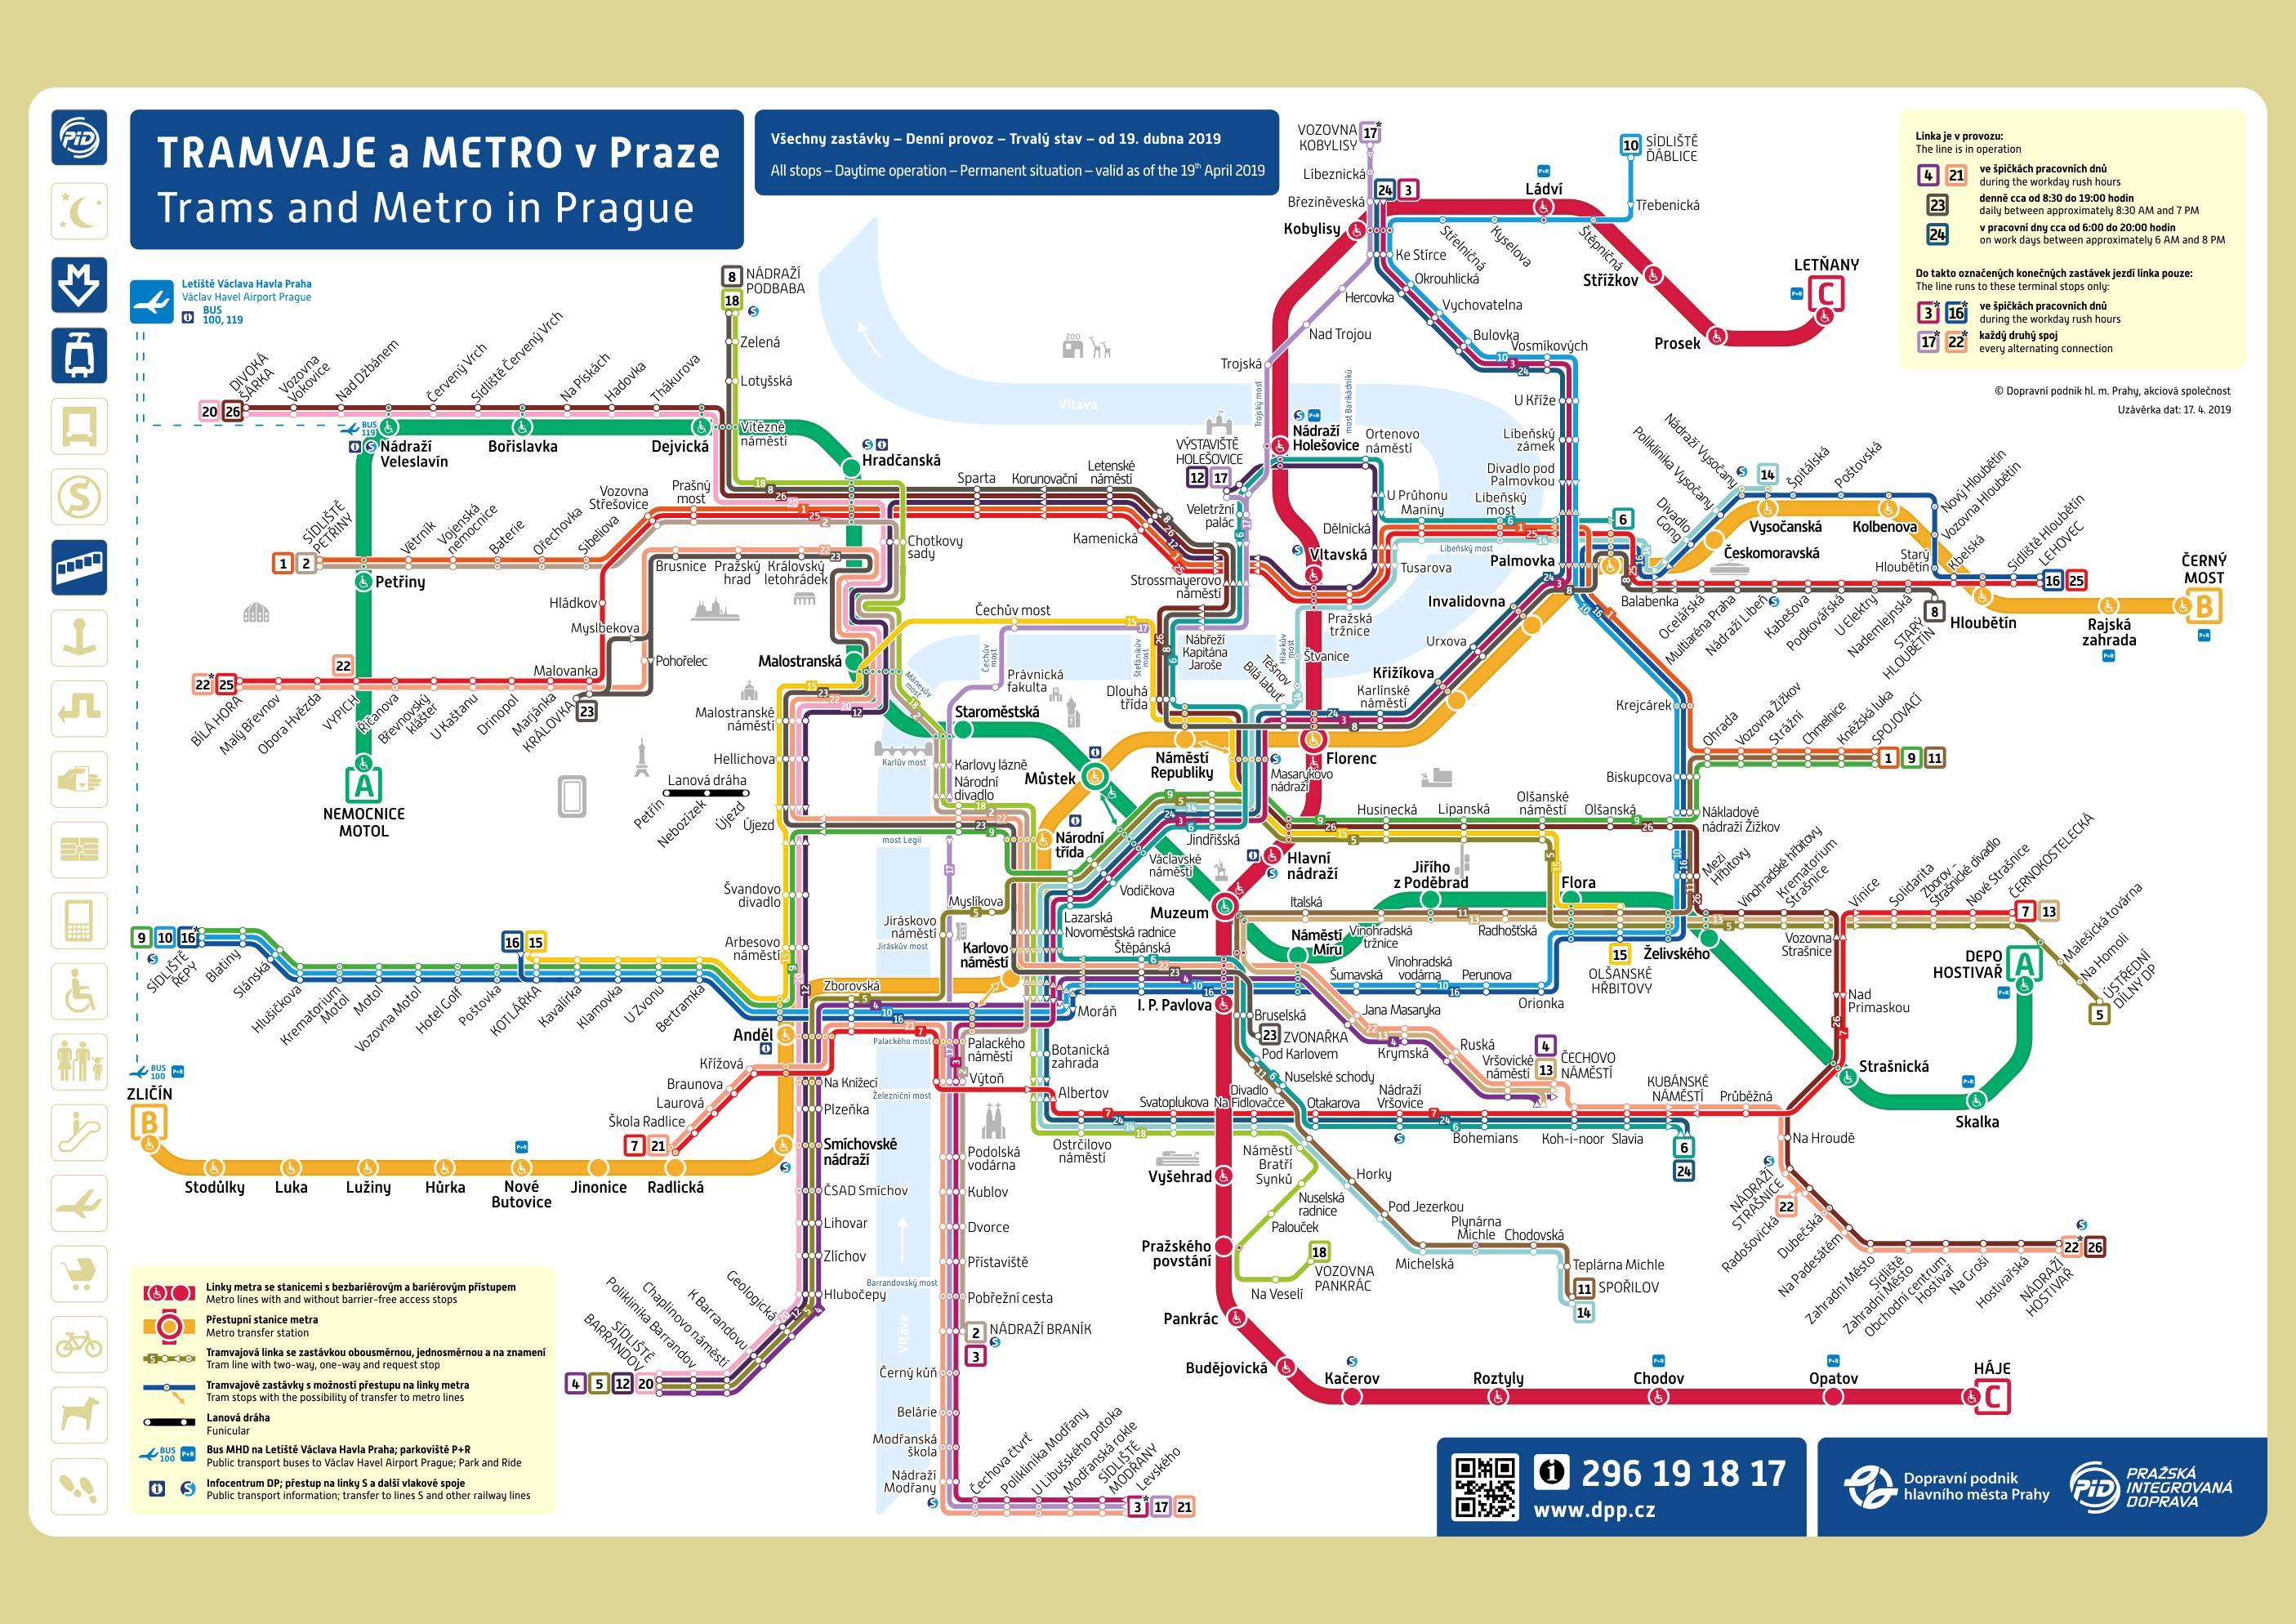 prague tram map pdf Prague Maps Transport Maps And Tourist Maps Of Prague In Czechia prague tram map pdf